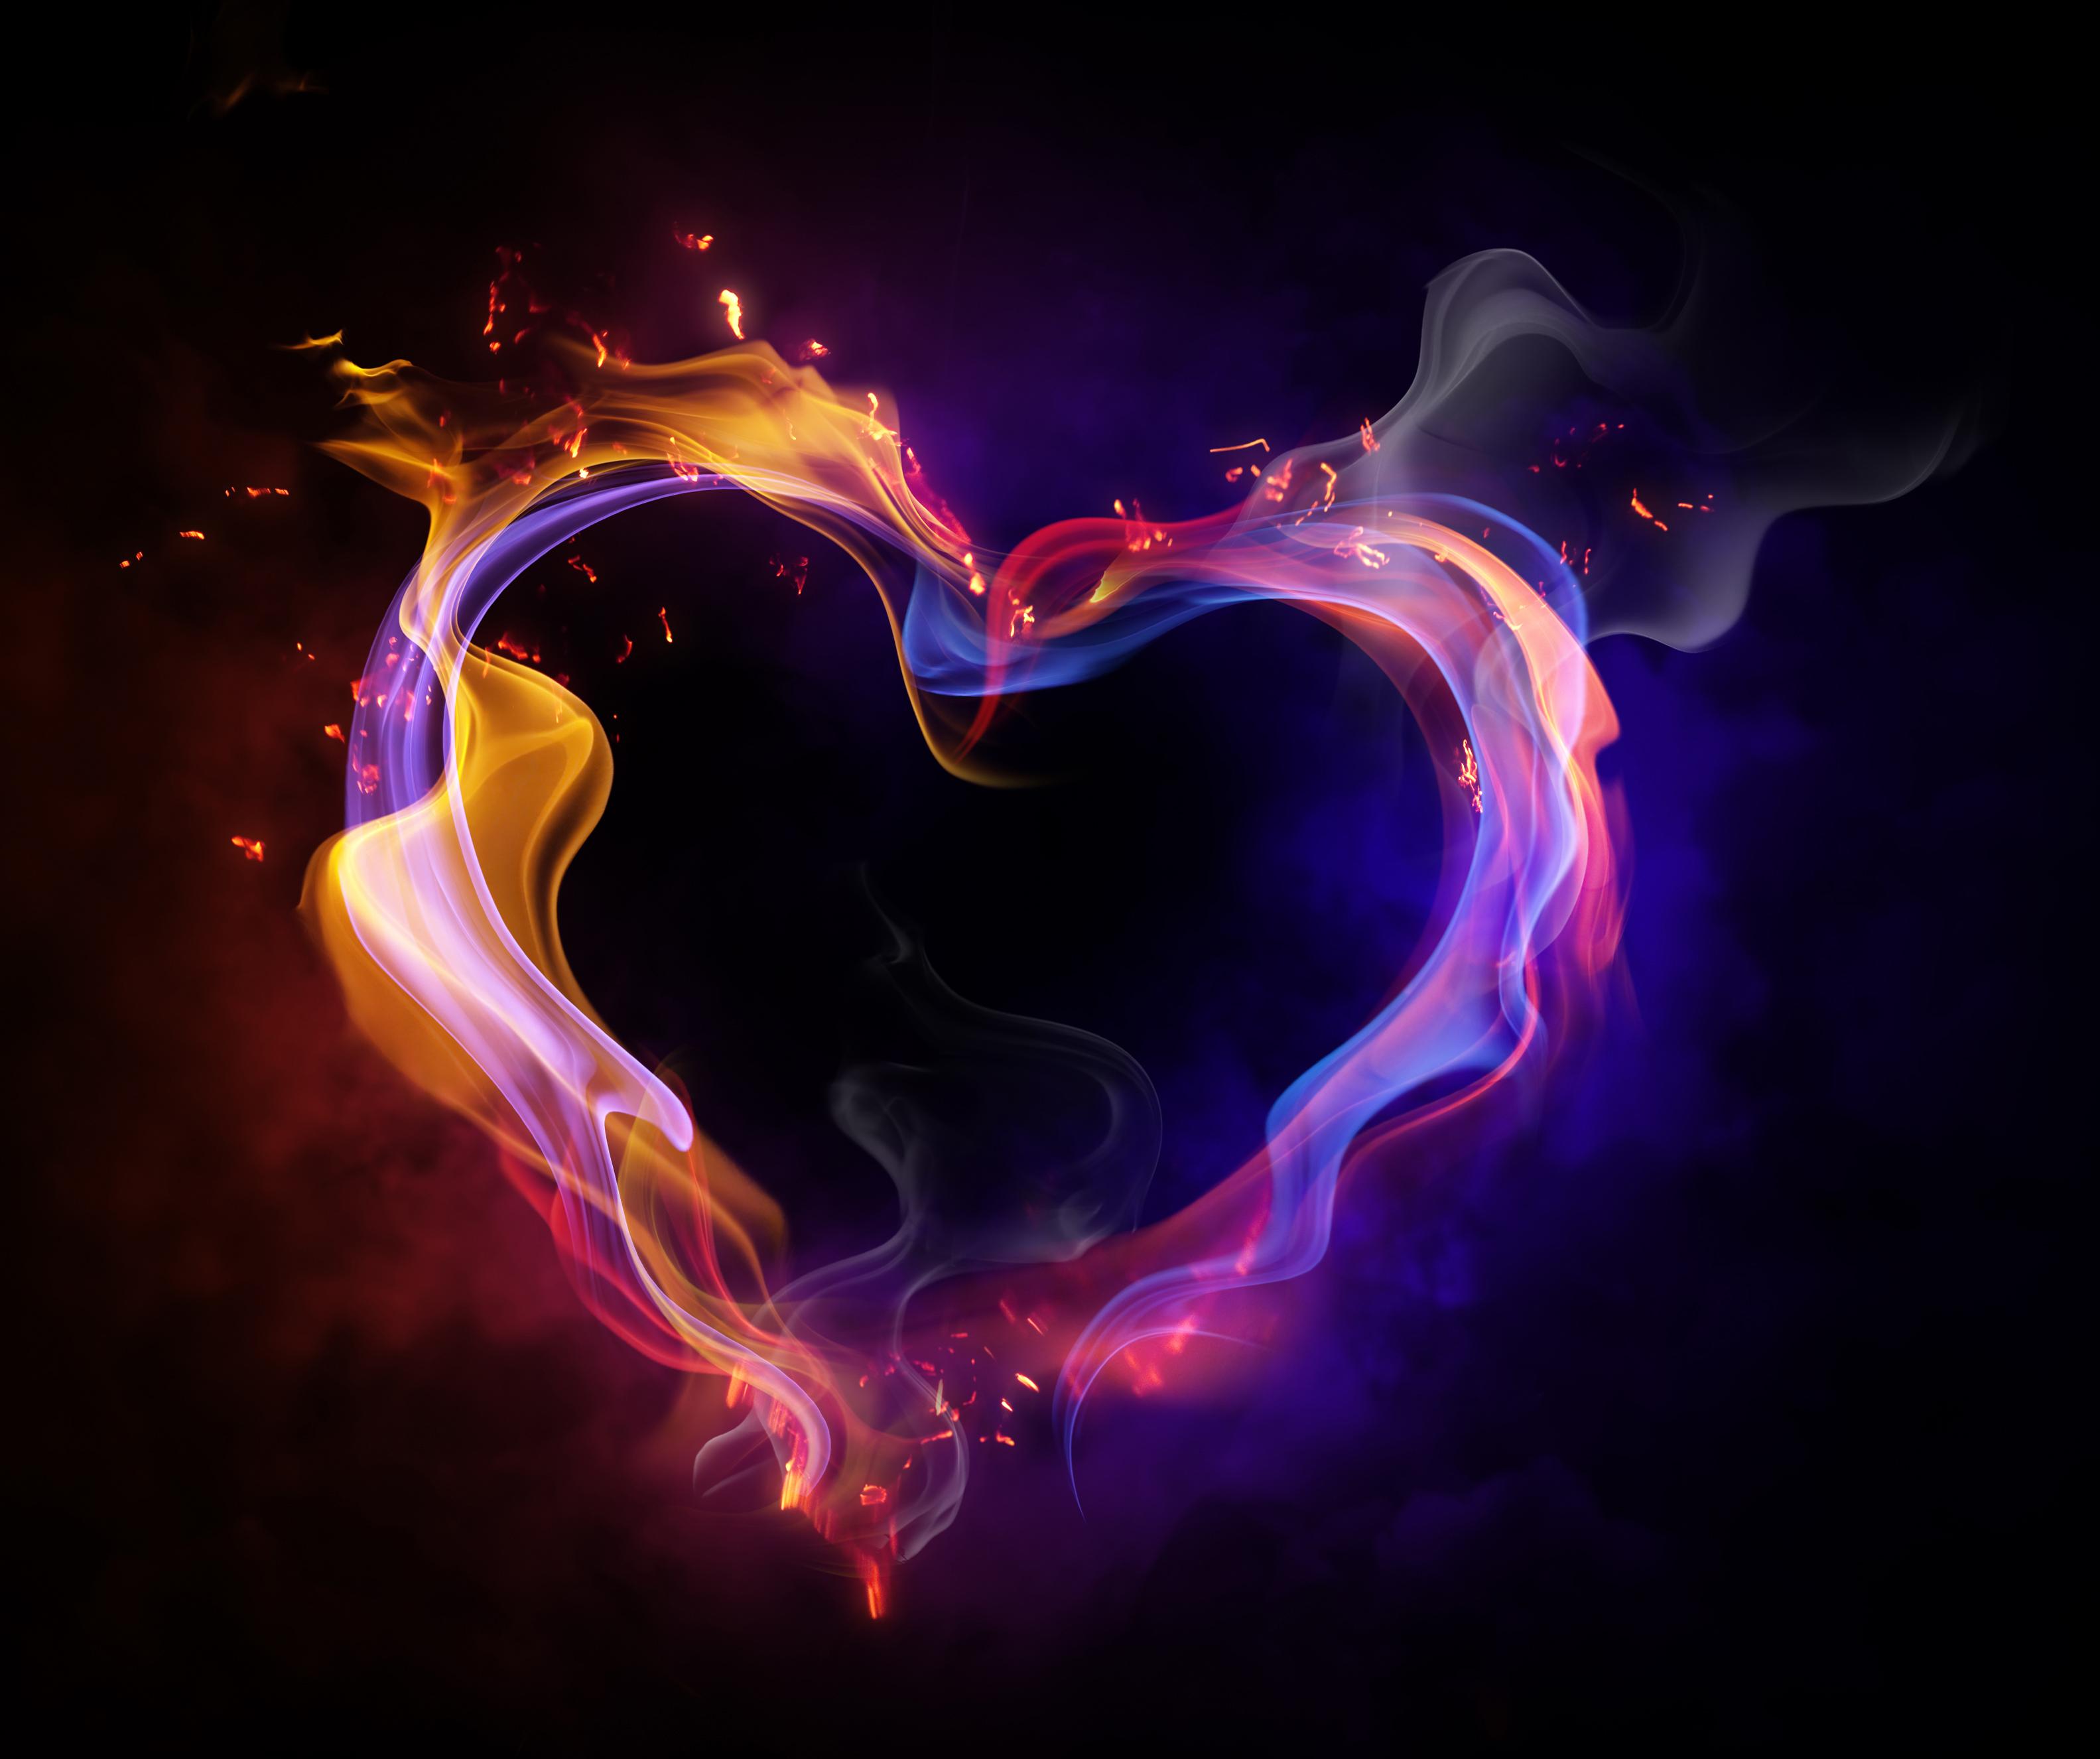 Heart smoke png. Graphic design wallpaper cartoon